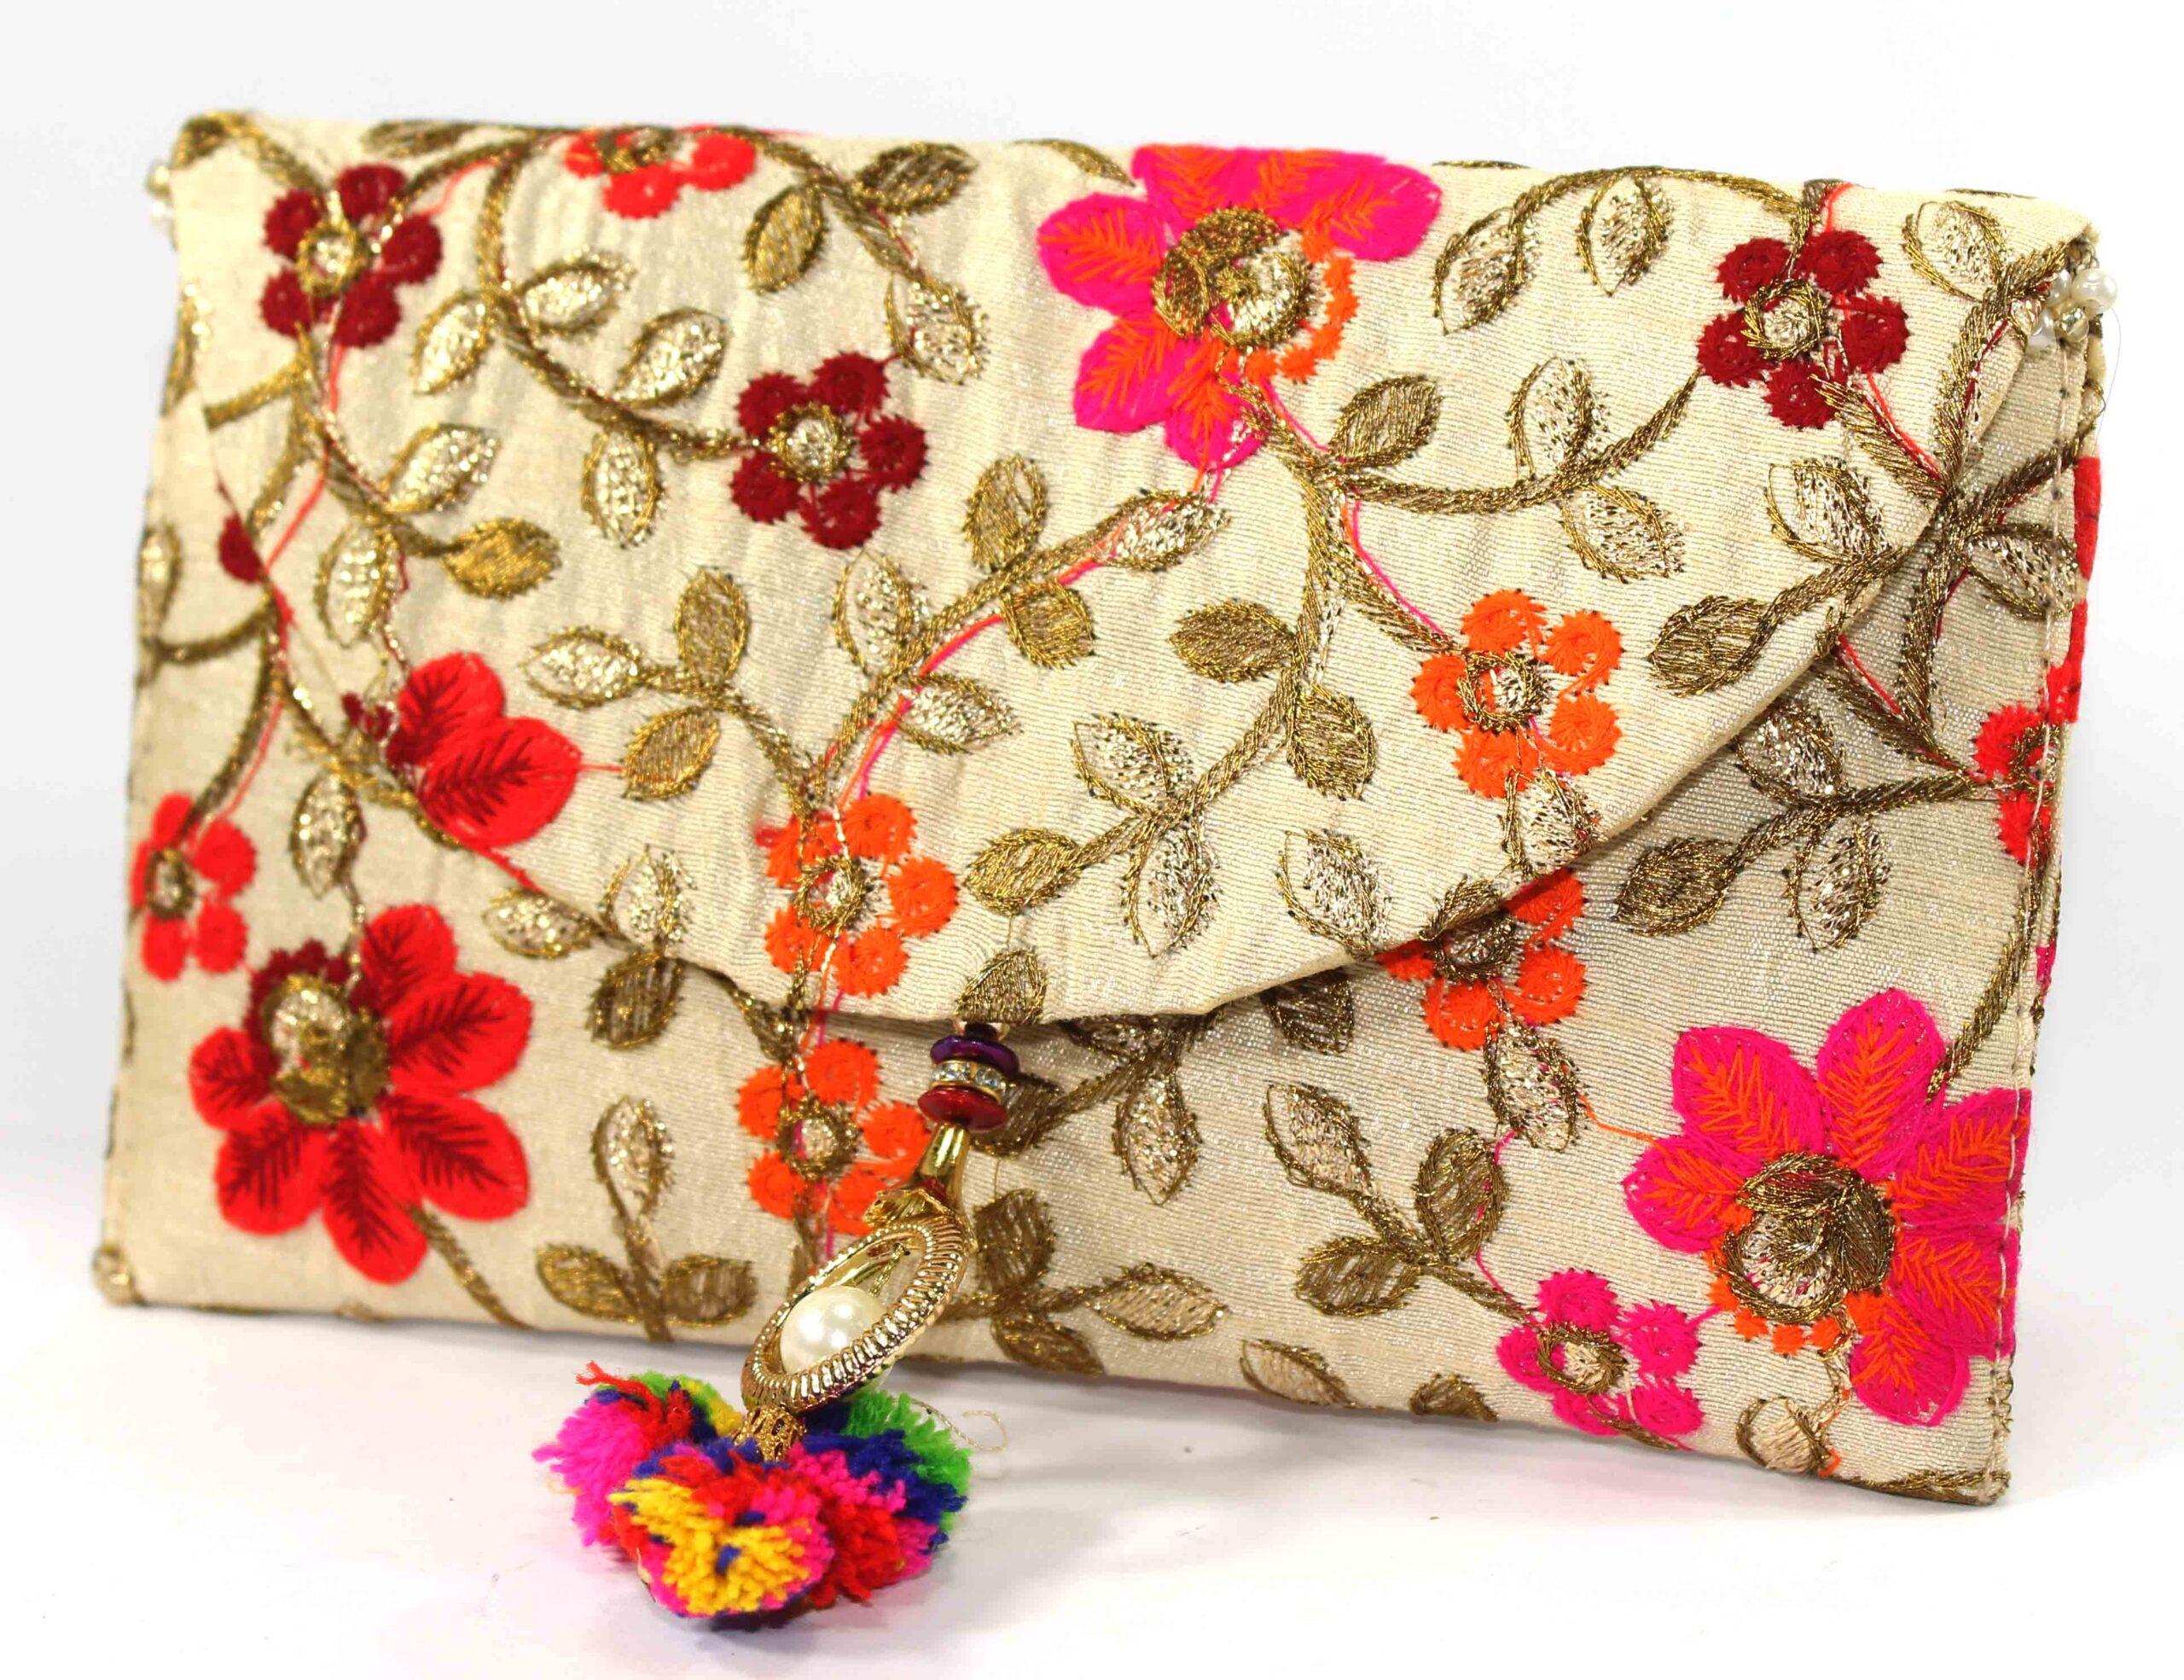 Pearl Sling Bag